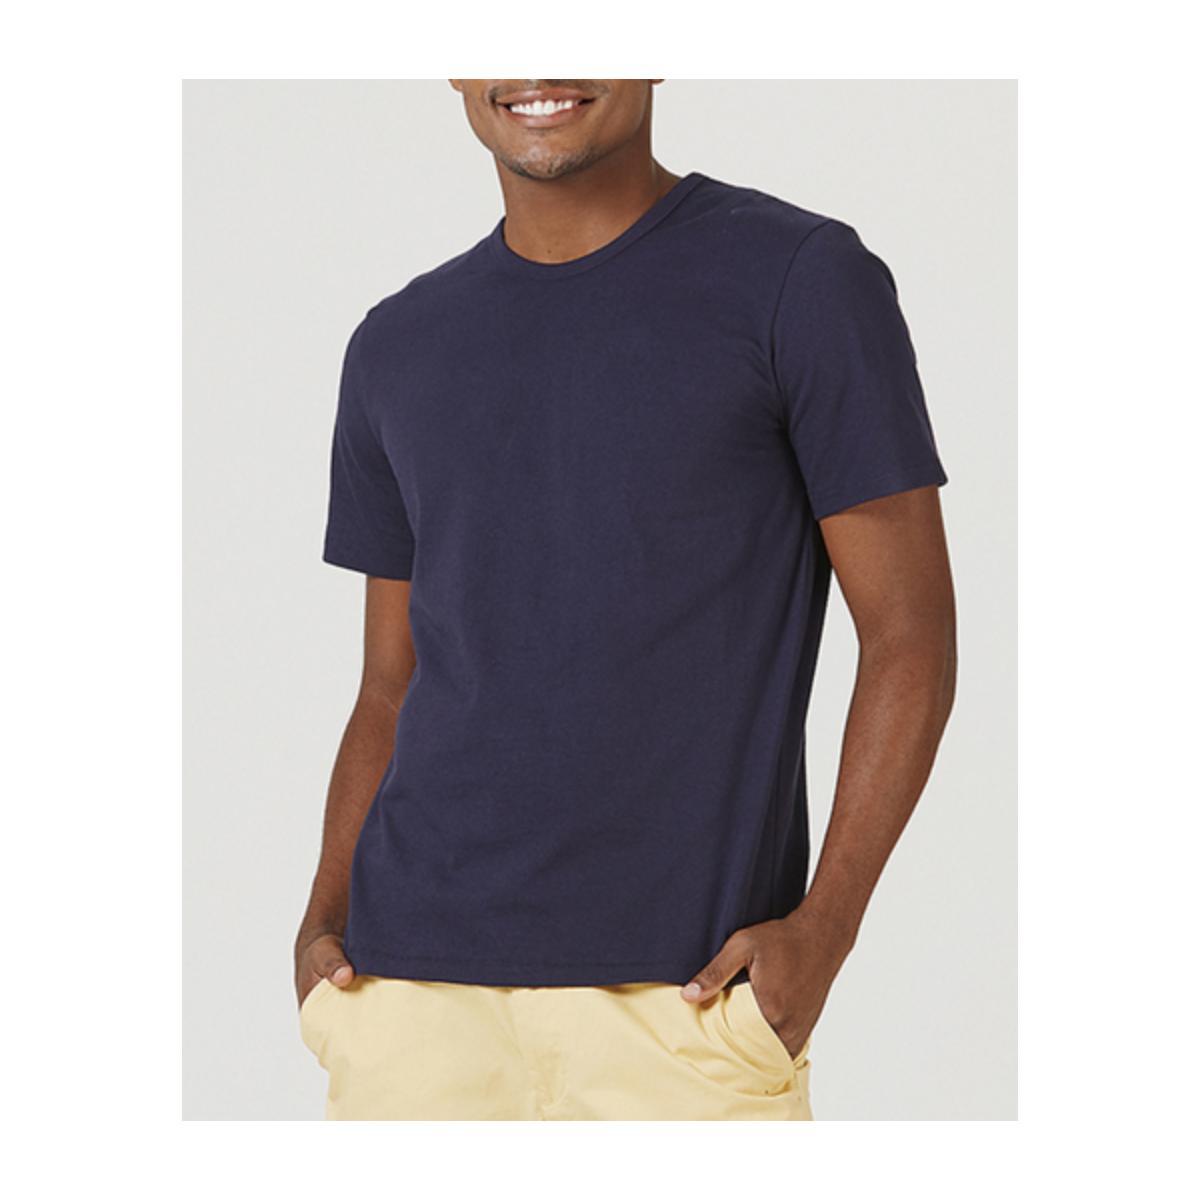 Camiseta Masculina Hering 0299 Ax7en Marinho